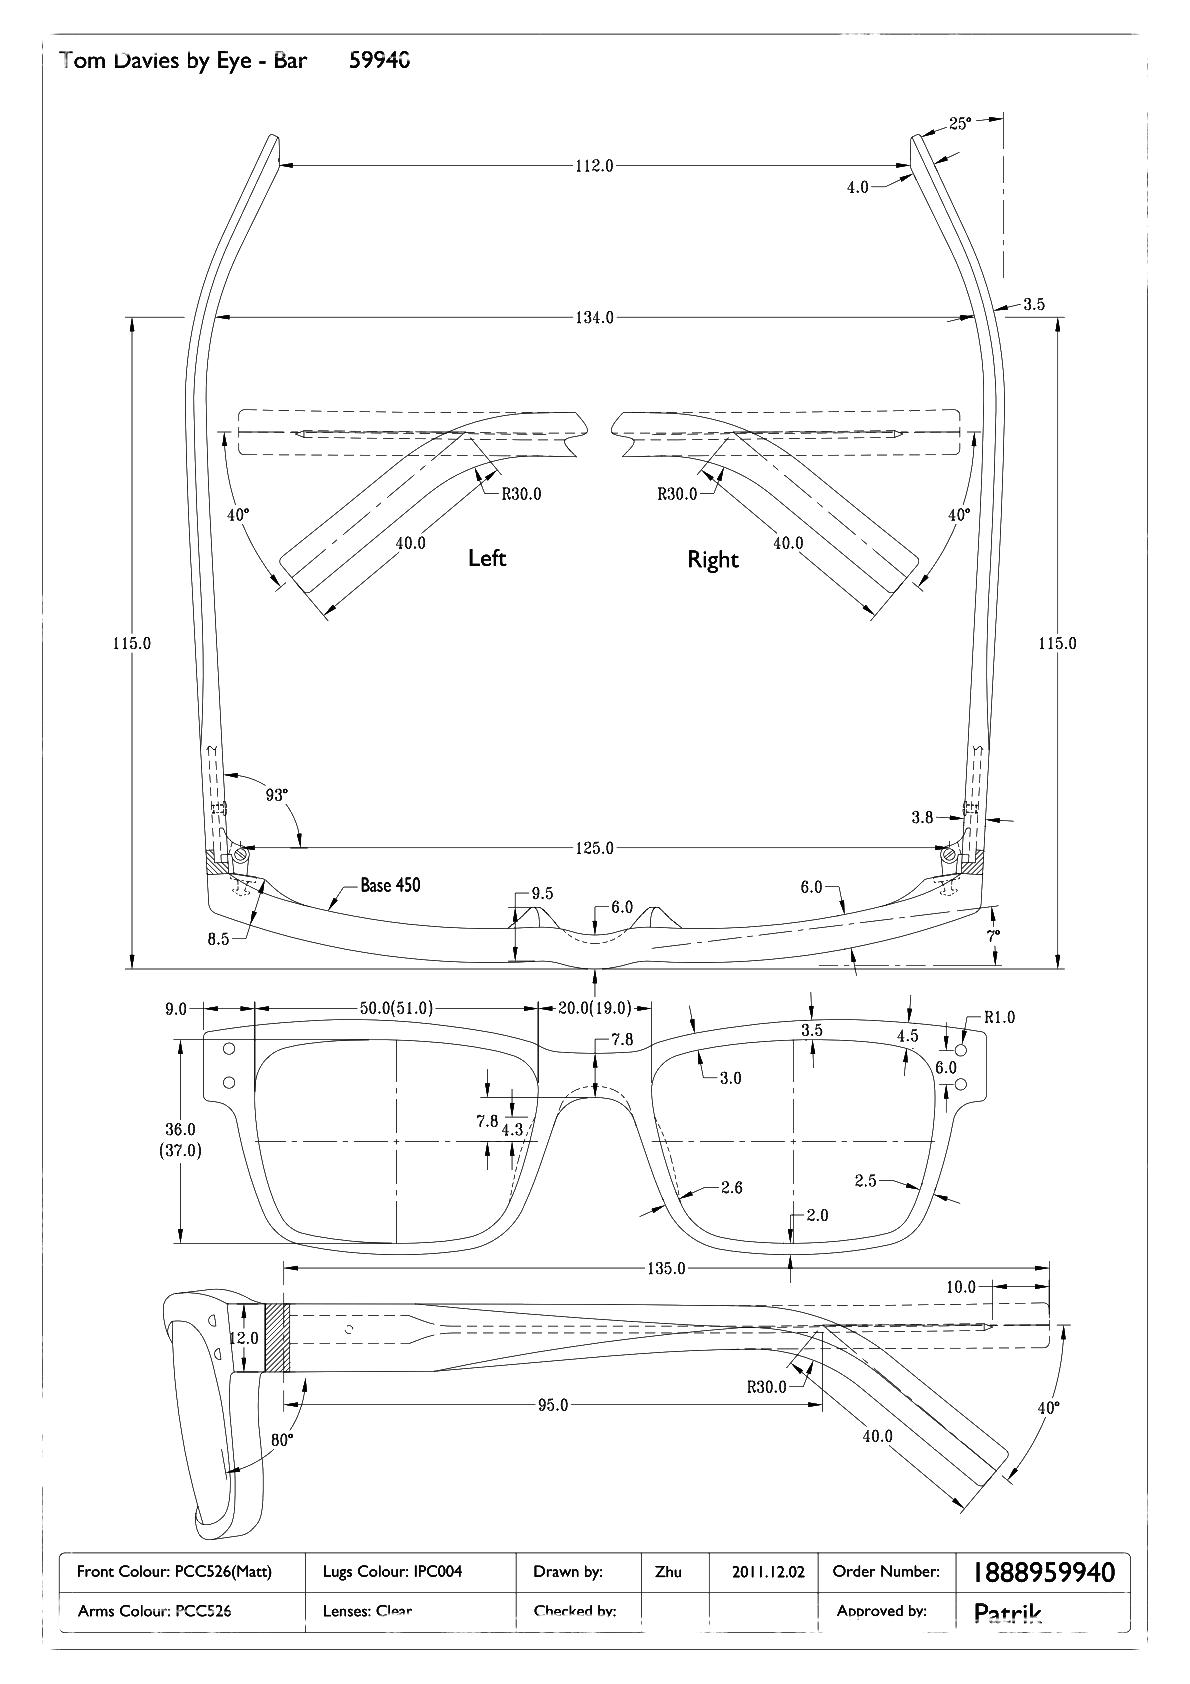 bespoke eyewear orders include personalized detailed blueprints